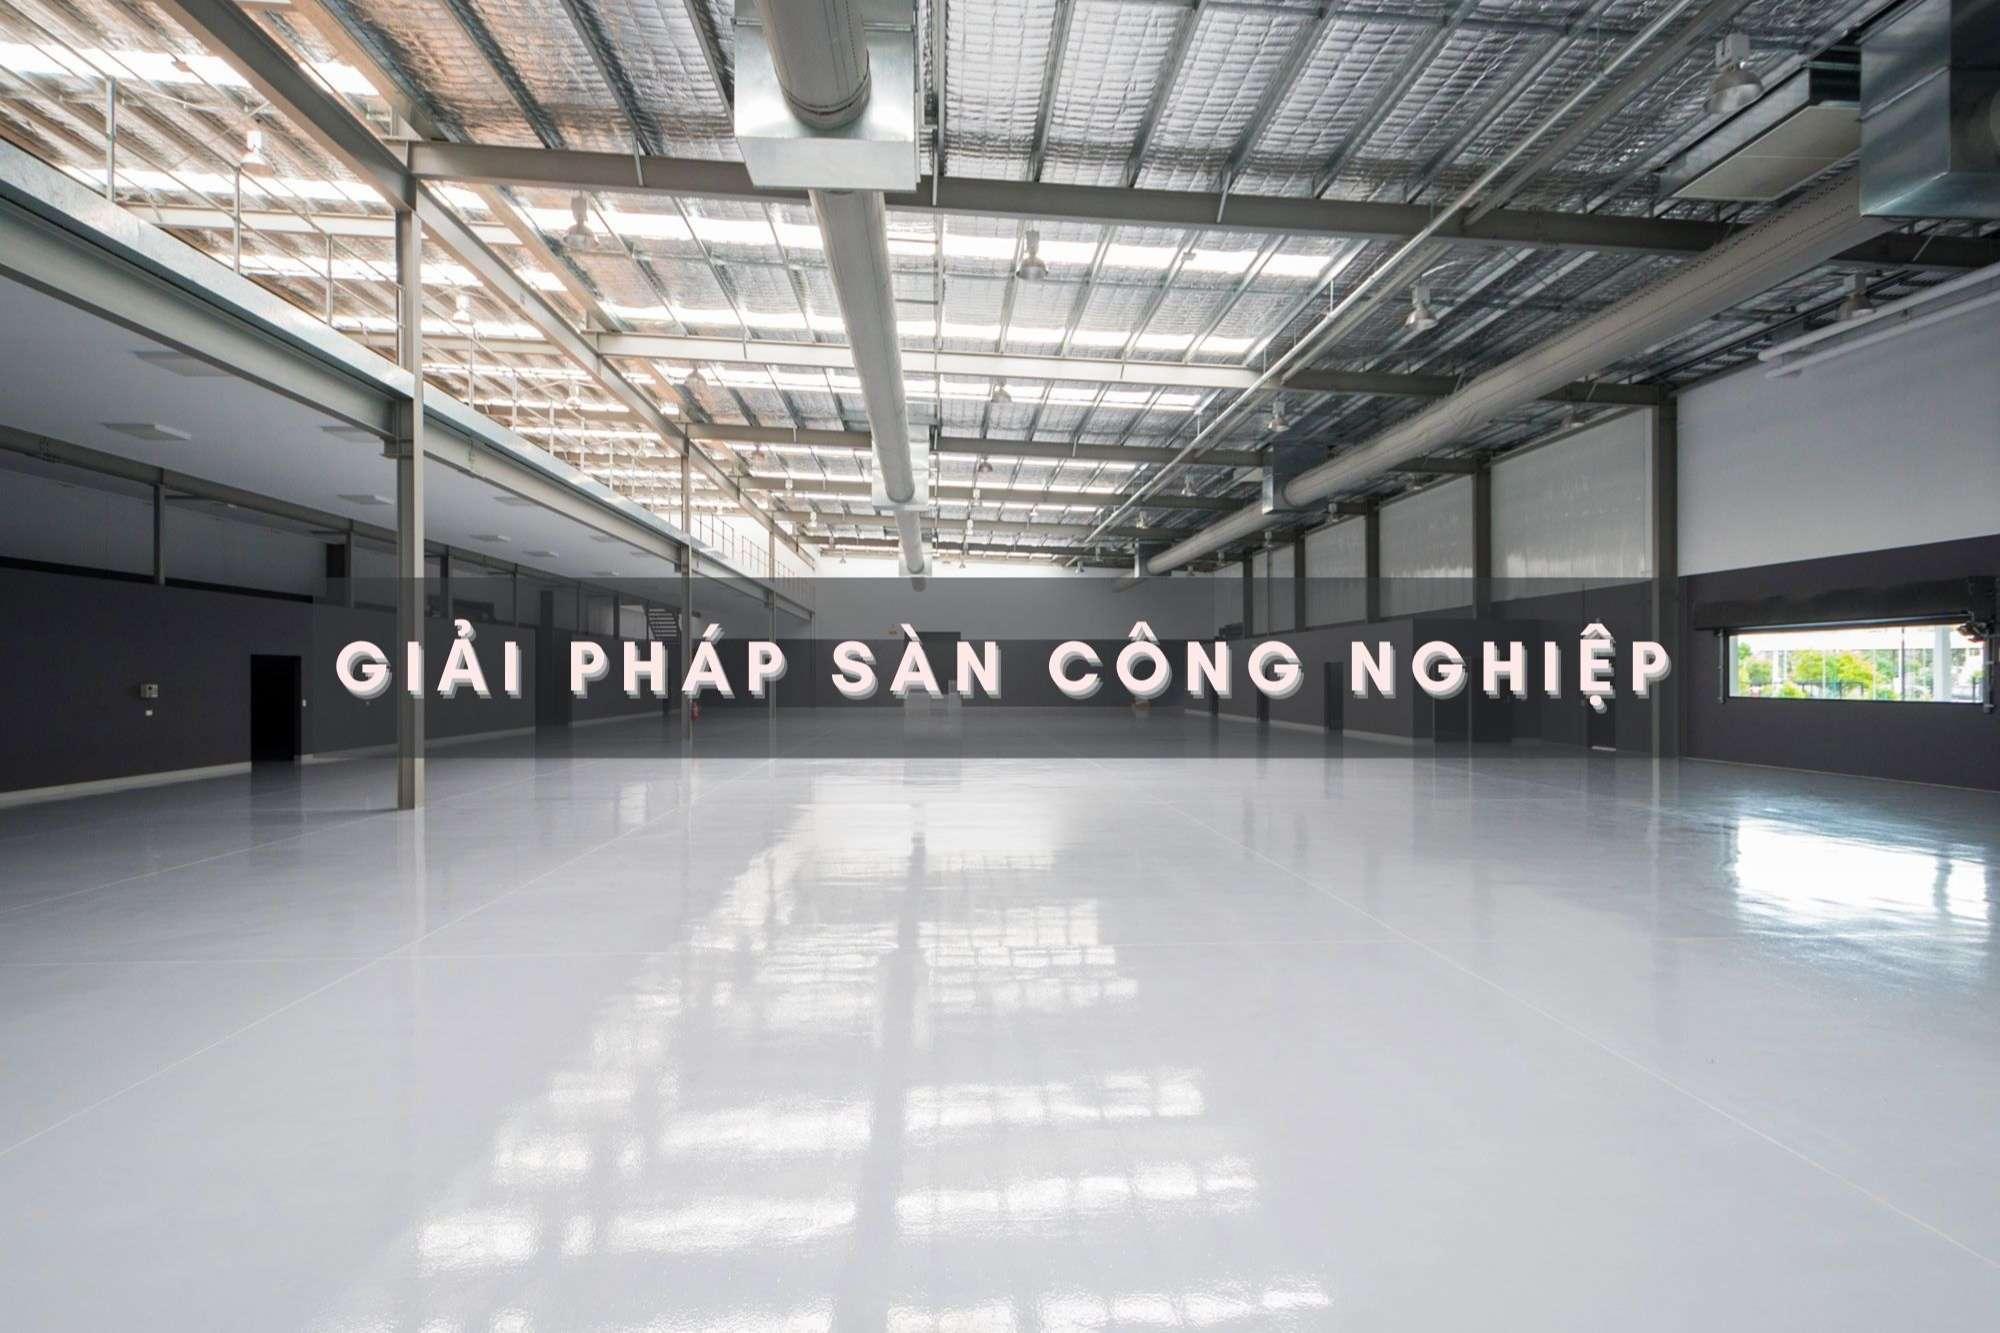 giai-phap-san-cong-nghiep